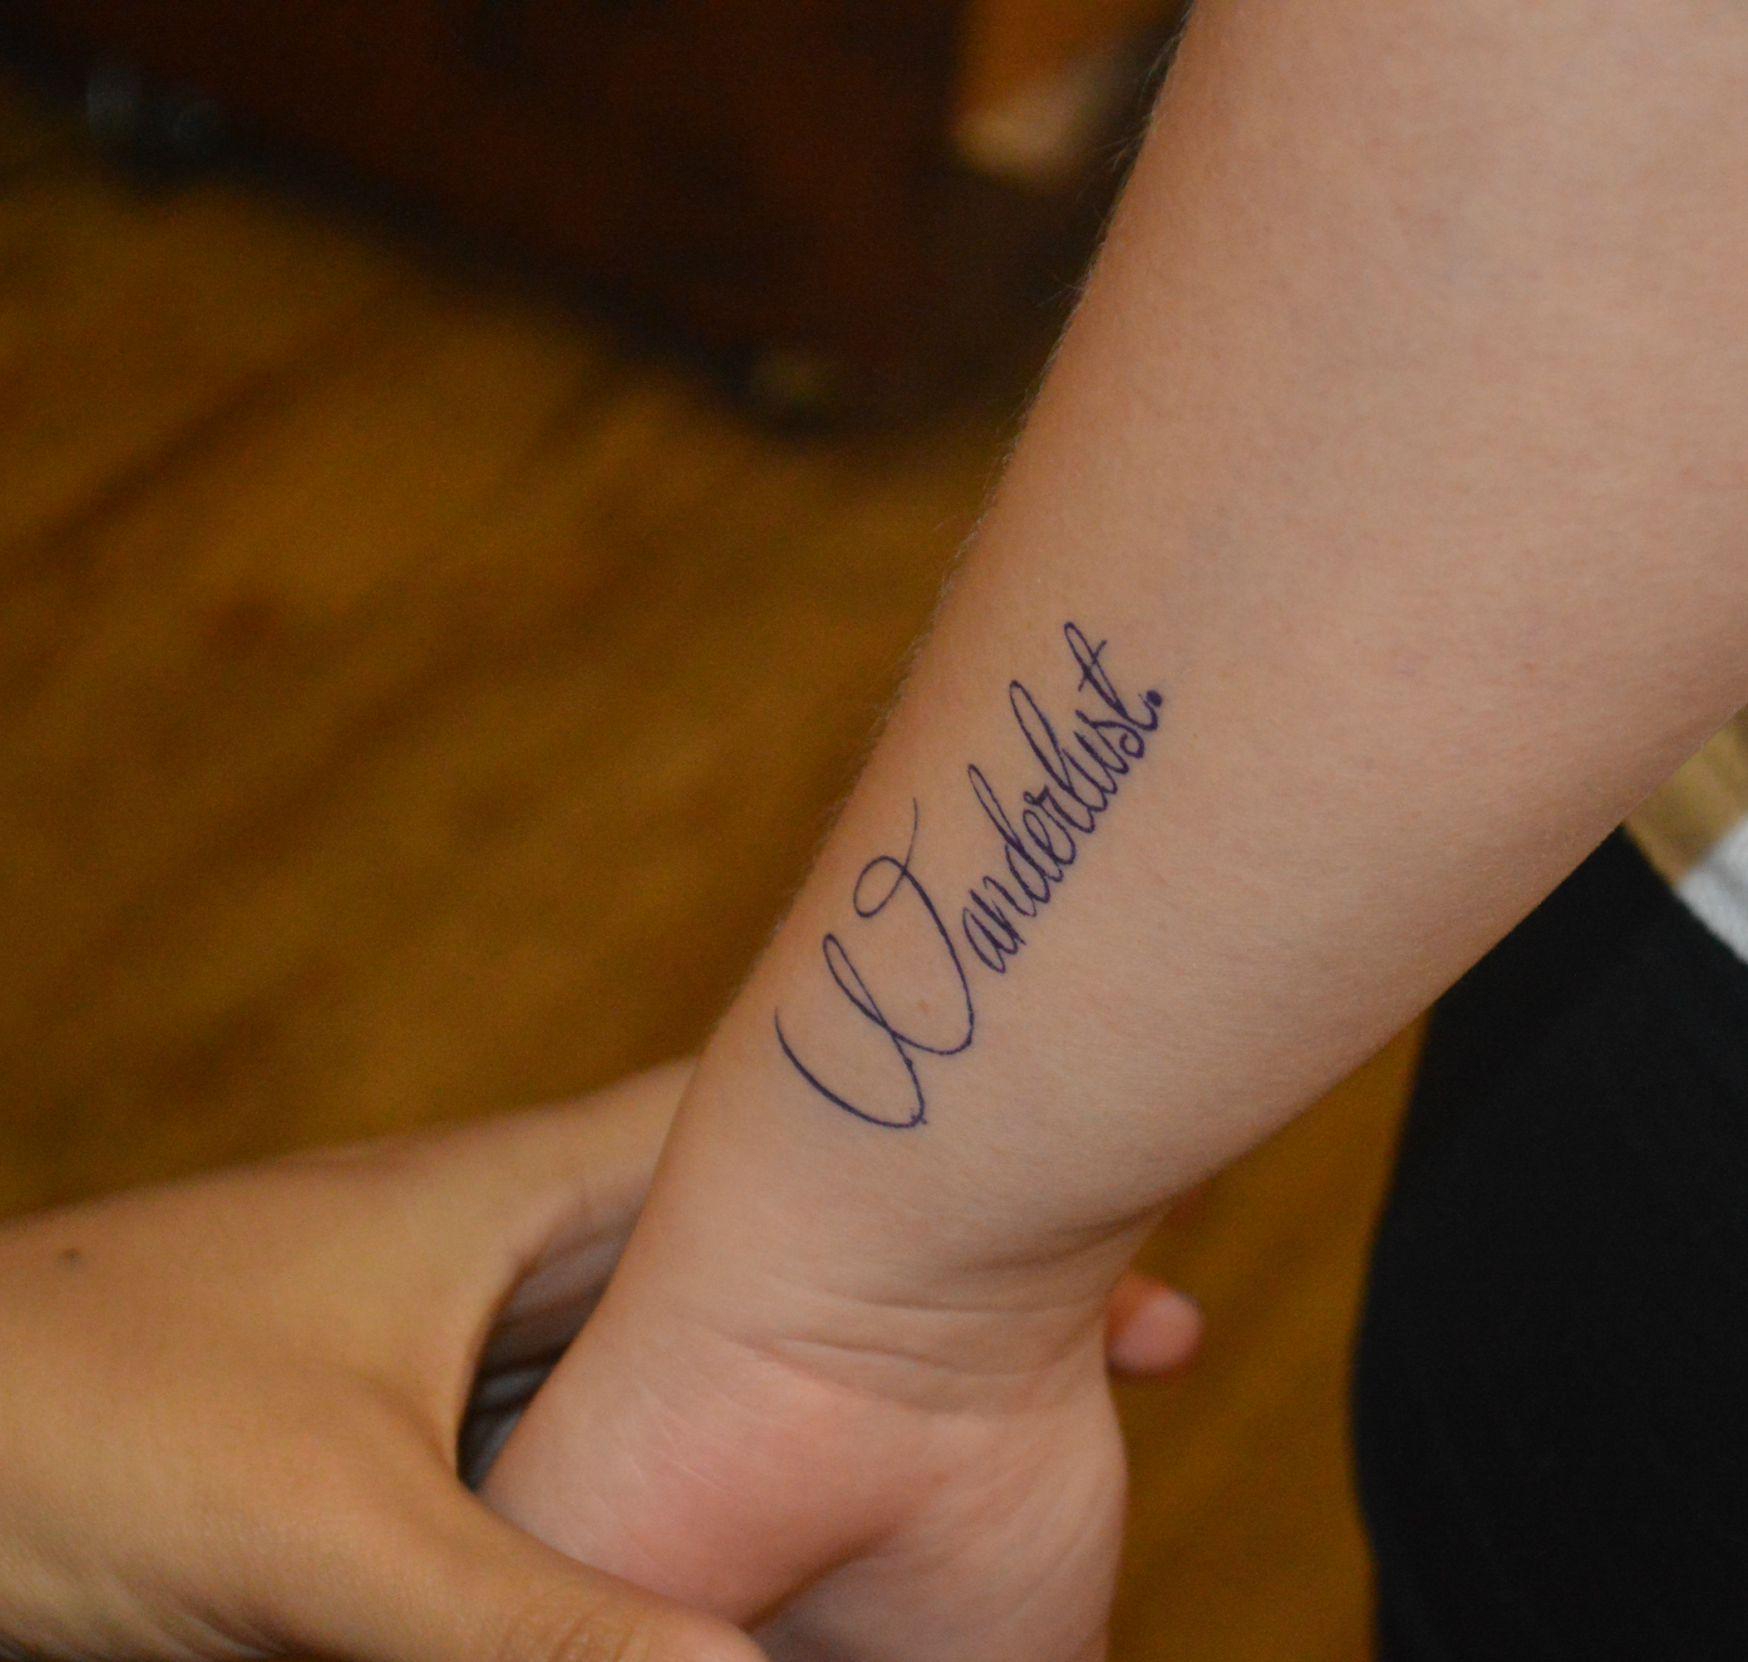 tatoo,nyc,brooklyn,delphine3